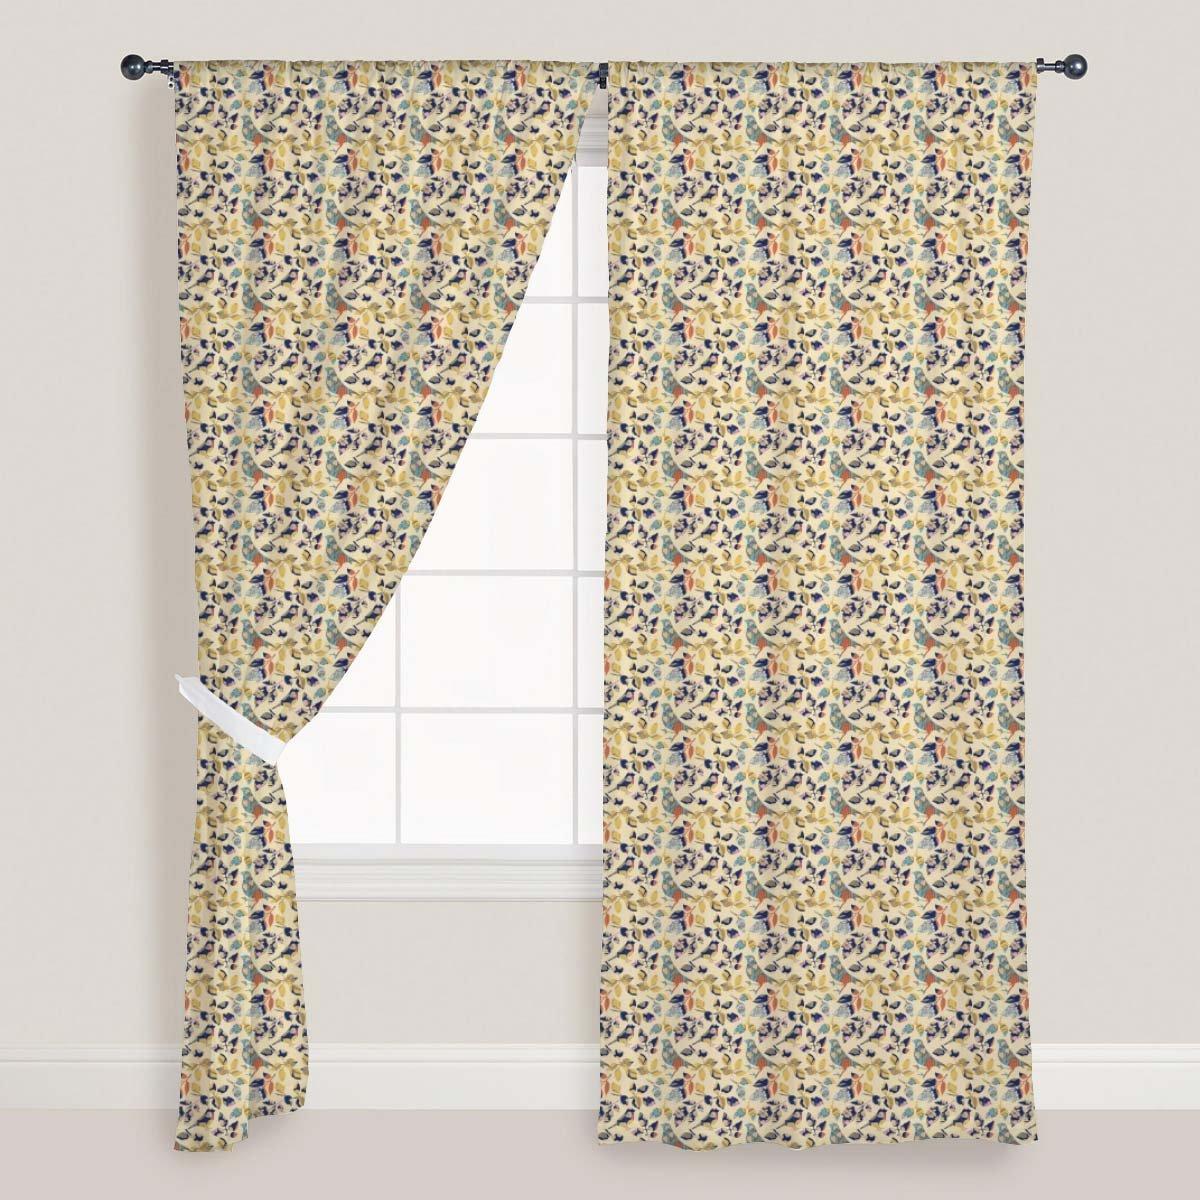 AZ Chirping Birds Door & Window Curtain Satin 4feet x 11feet; SET OF 2 PCS